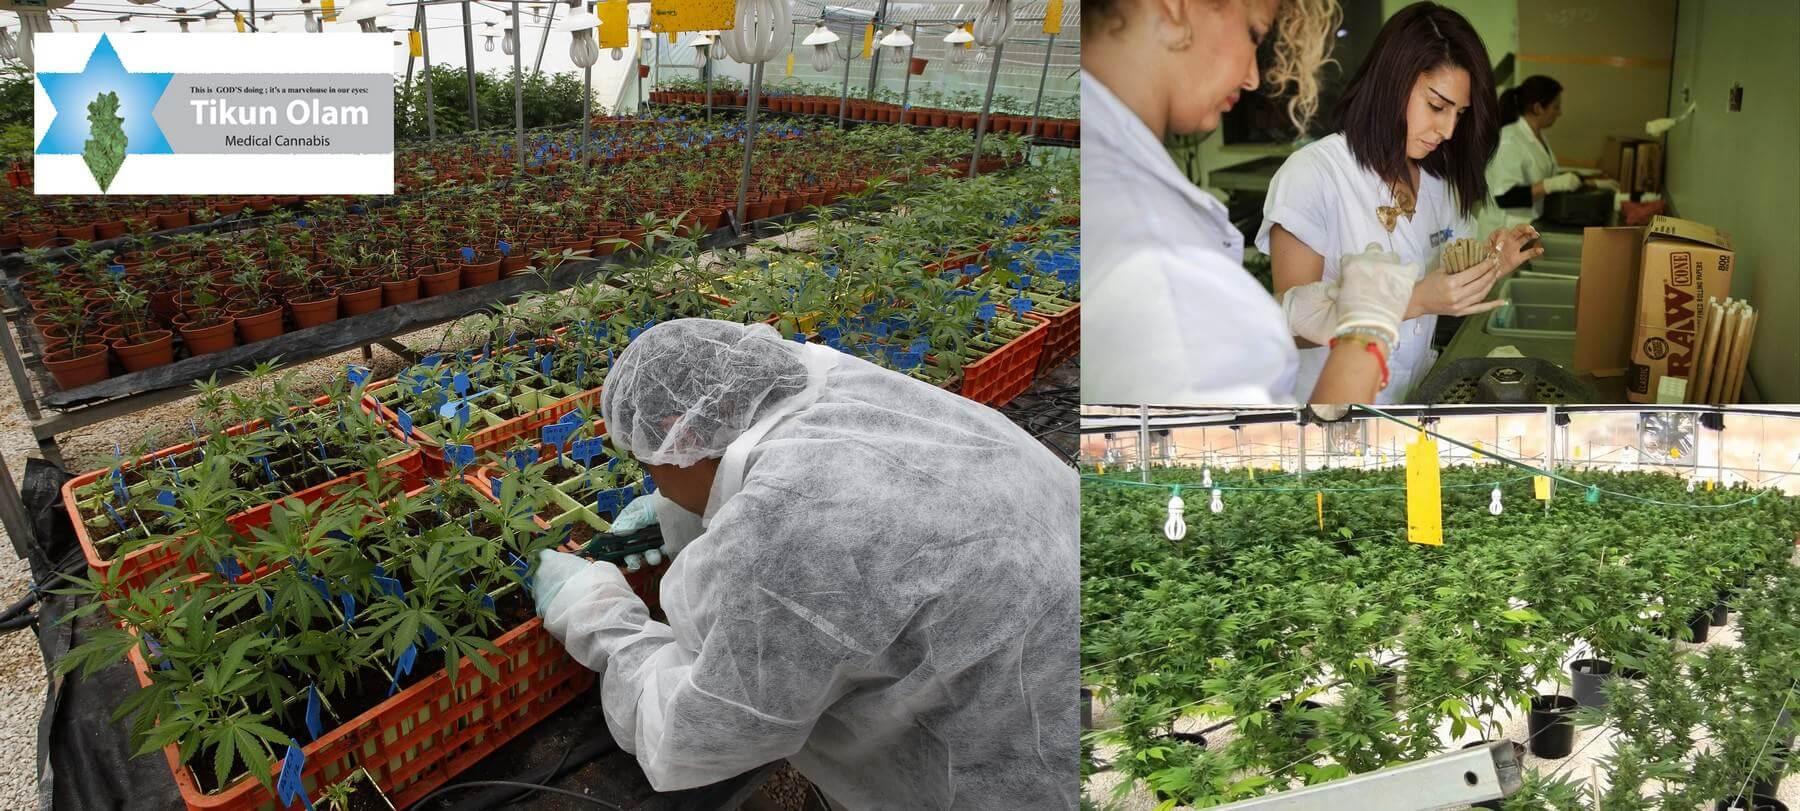 Tikun-Olam-cannabis-Israel